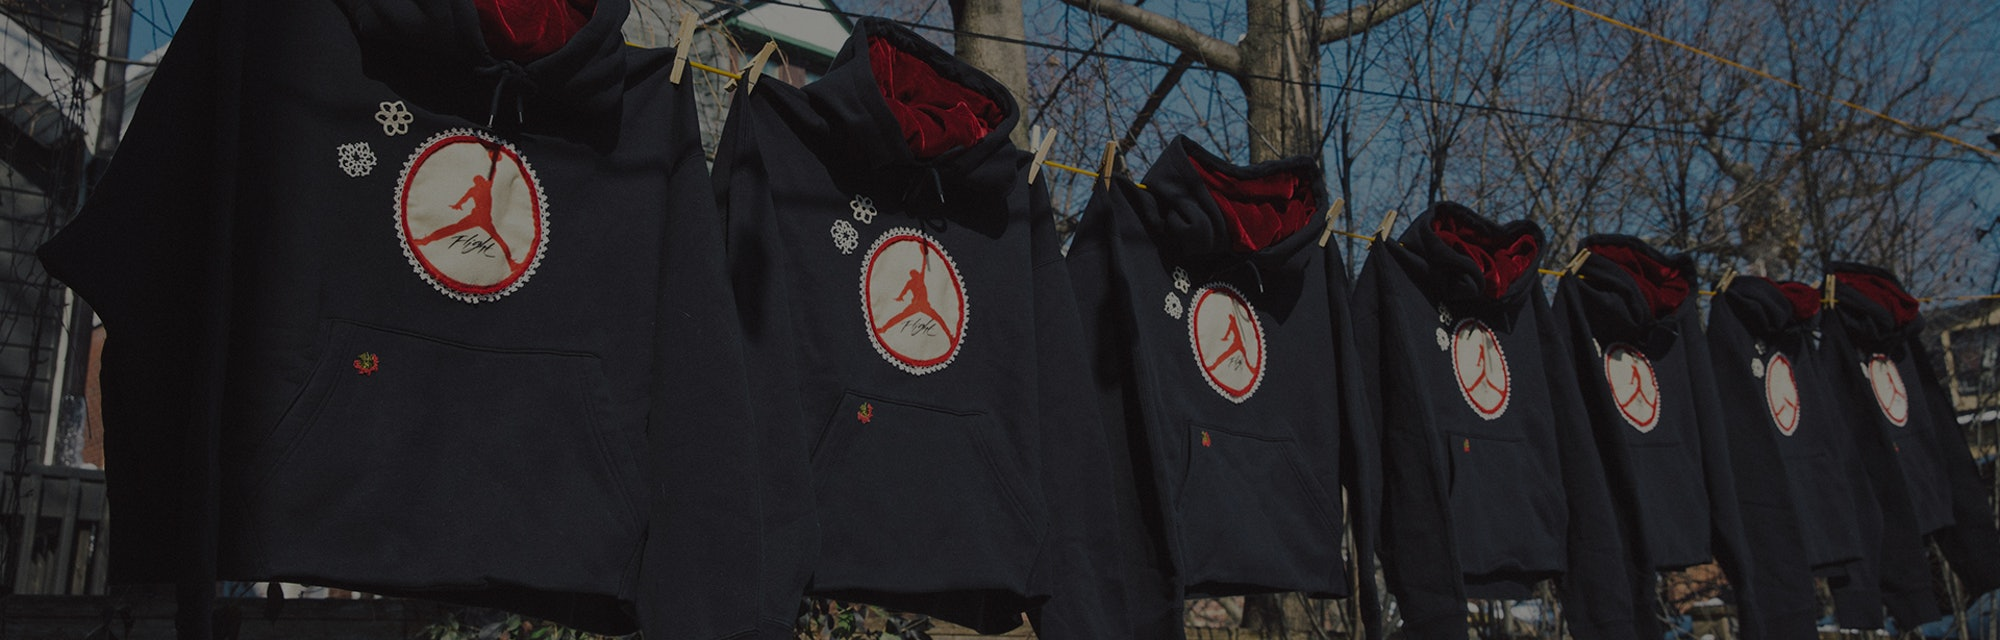 Jordan Brand Bentgablenits Custom WNBA Sweatsuits